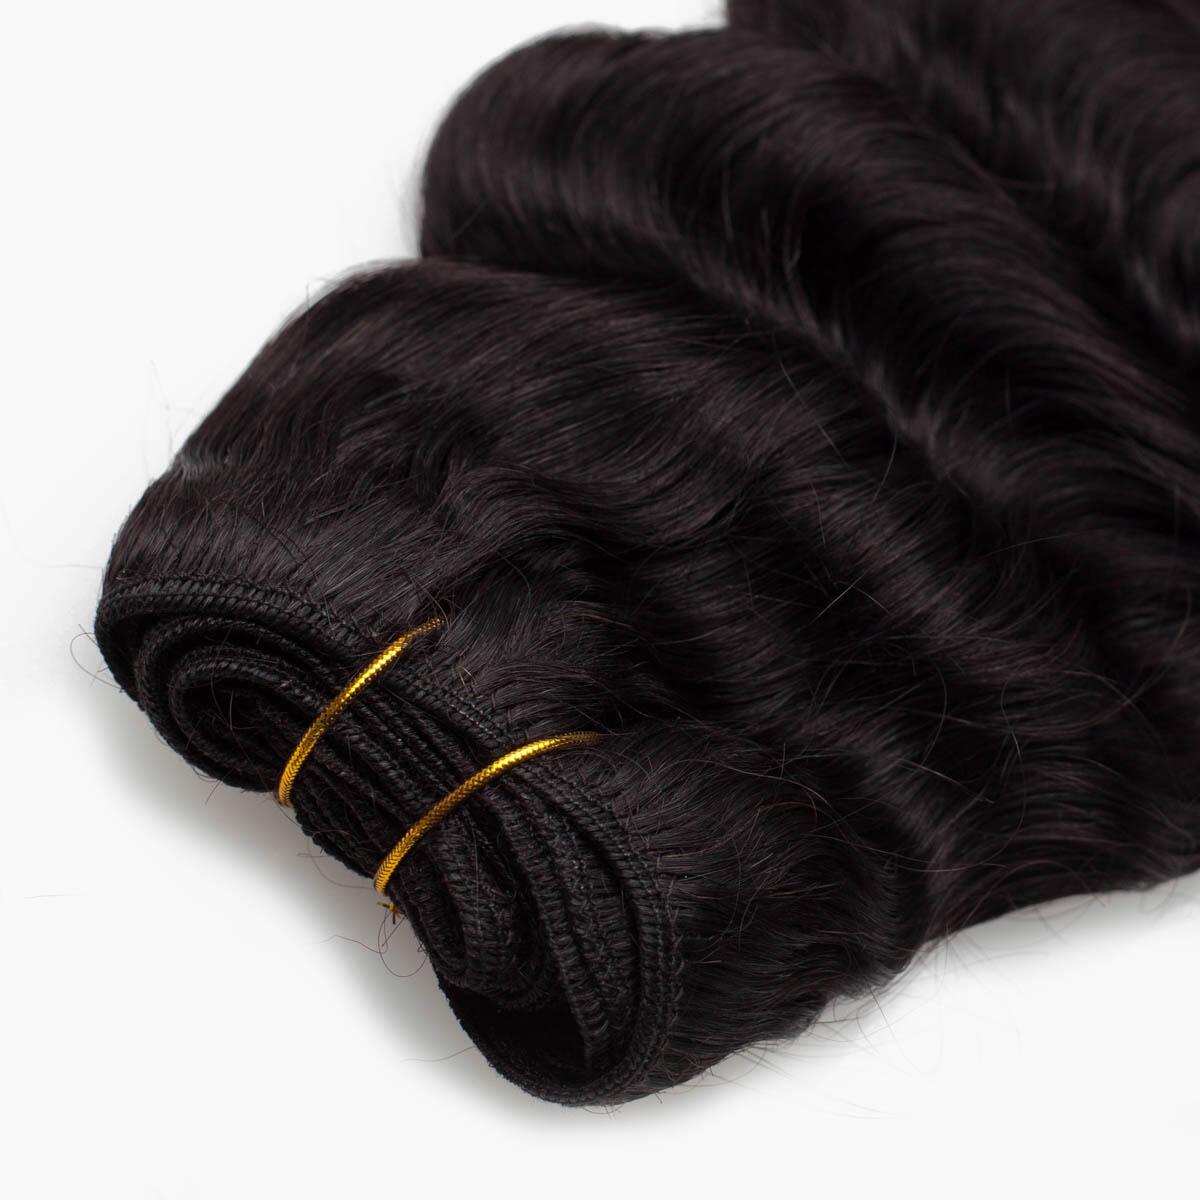 Hair Weft Soft Wave 1.2 Black Brown 45 cm